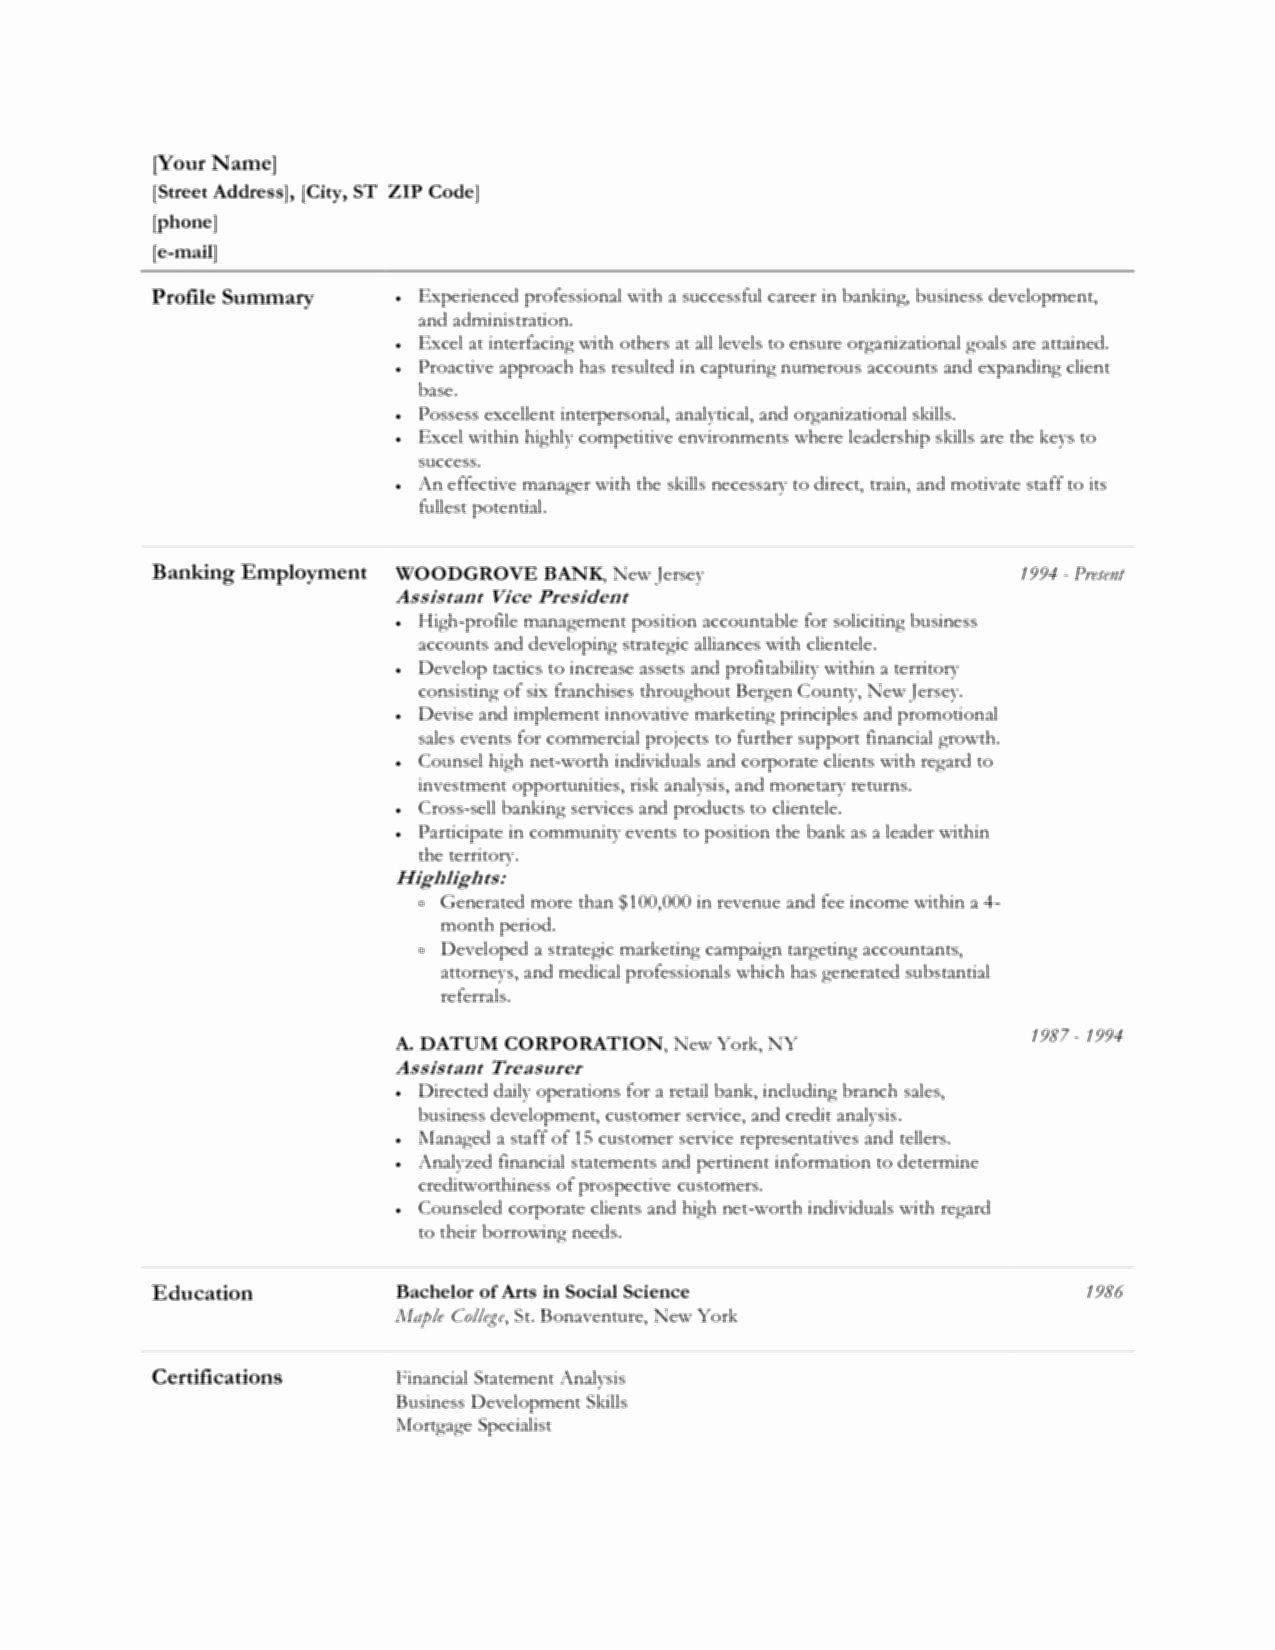 Bank Teller Resume Examples Beautiful Bank Teller Resume